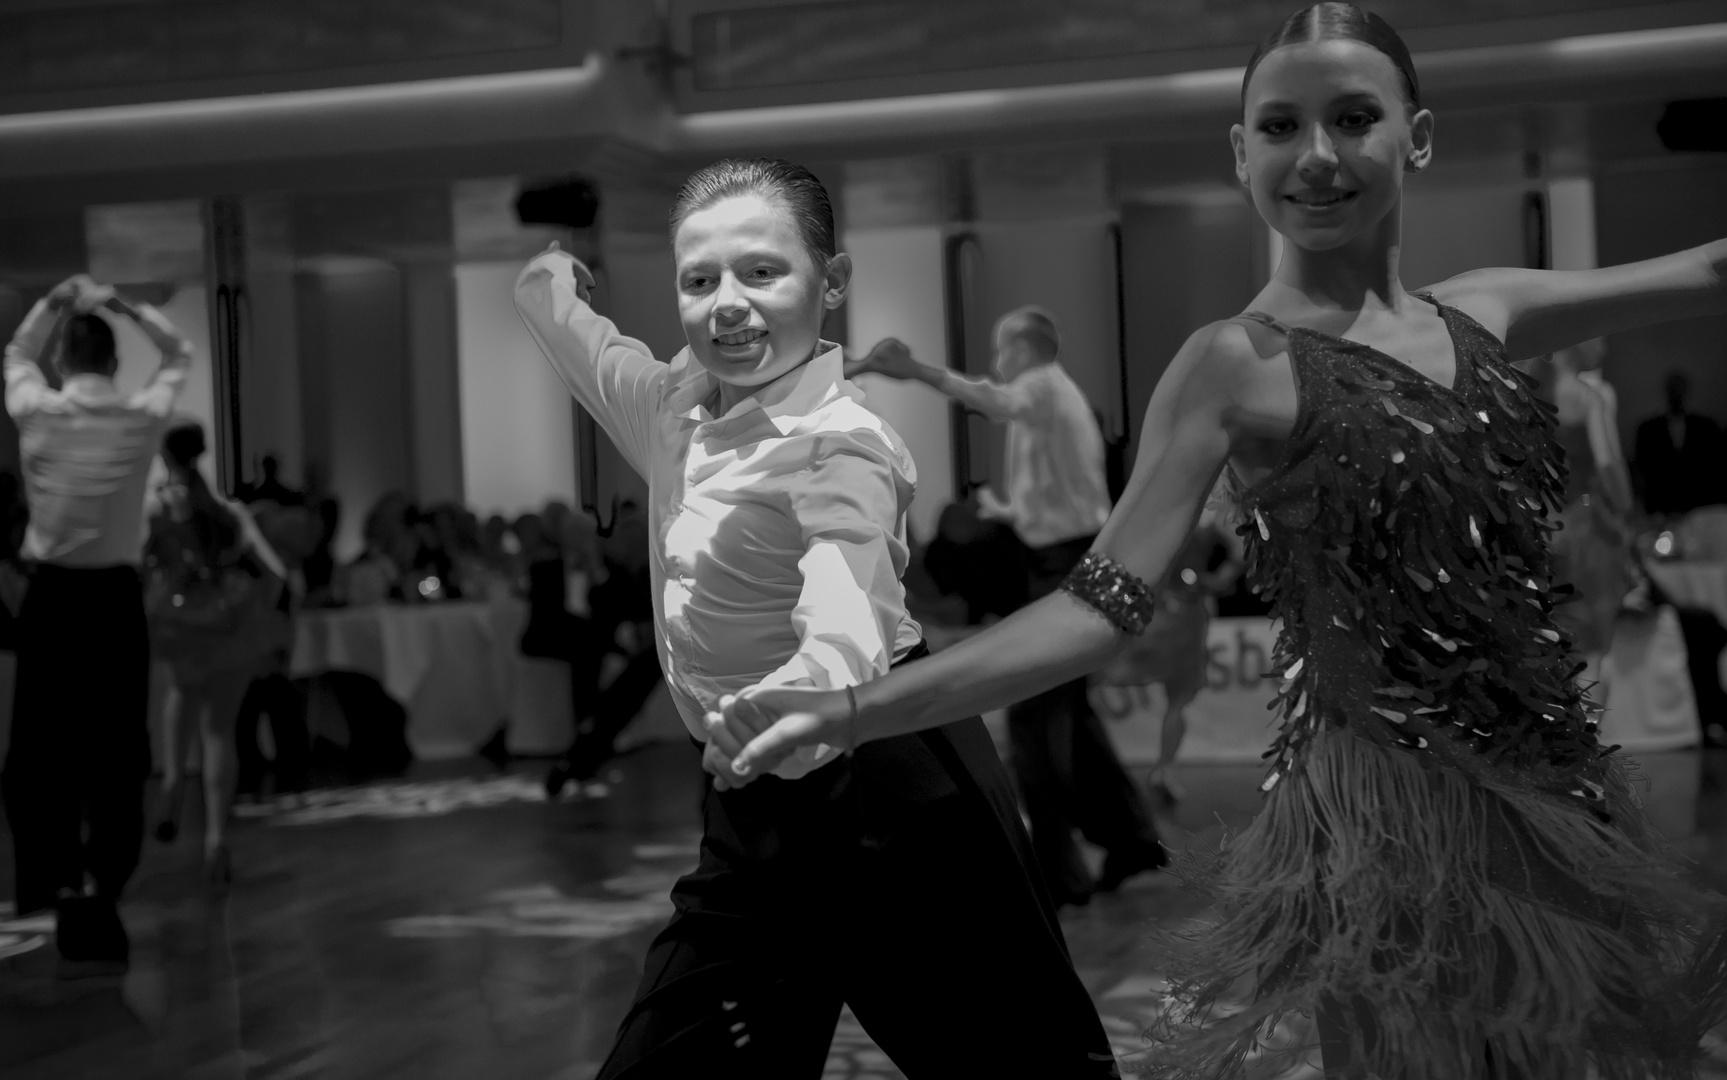 Tanzschule gutmann freiburg single